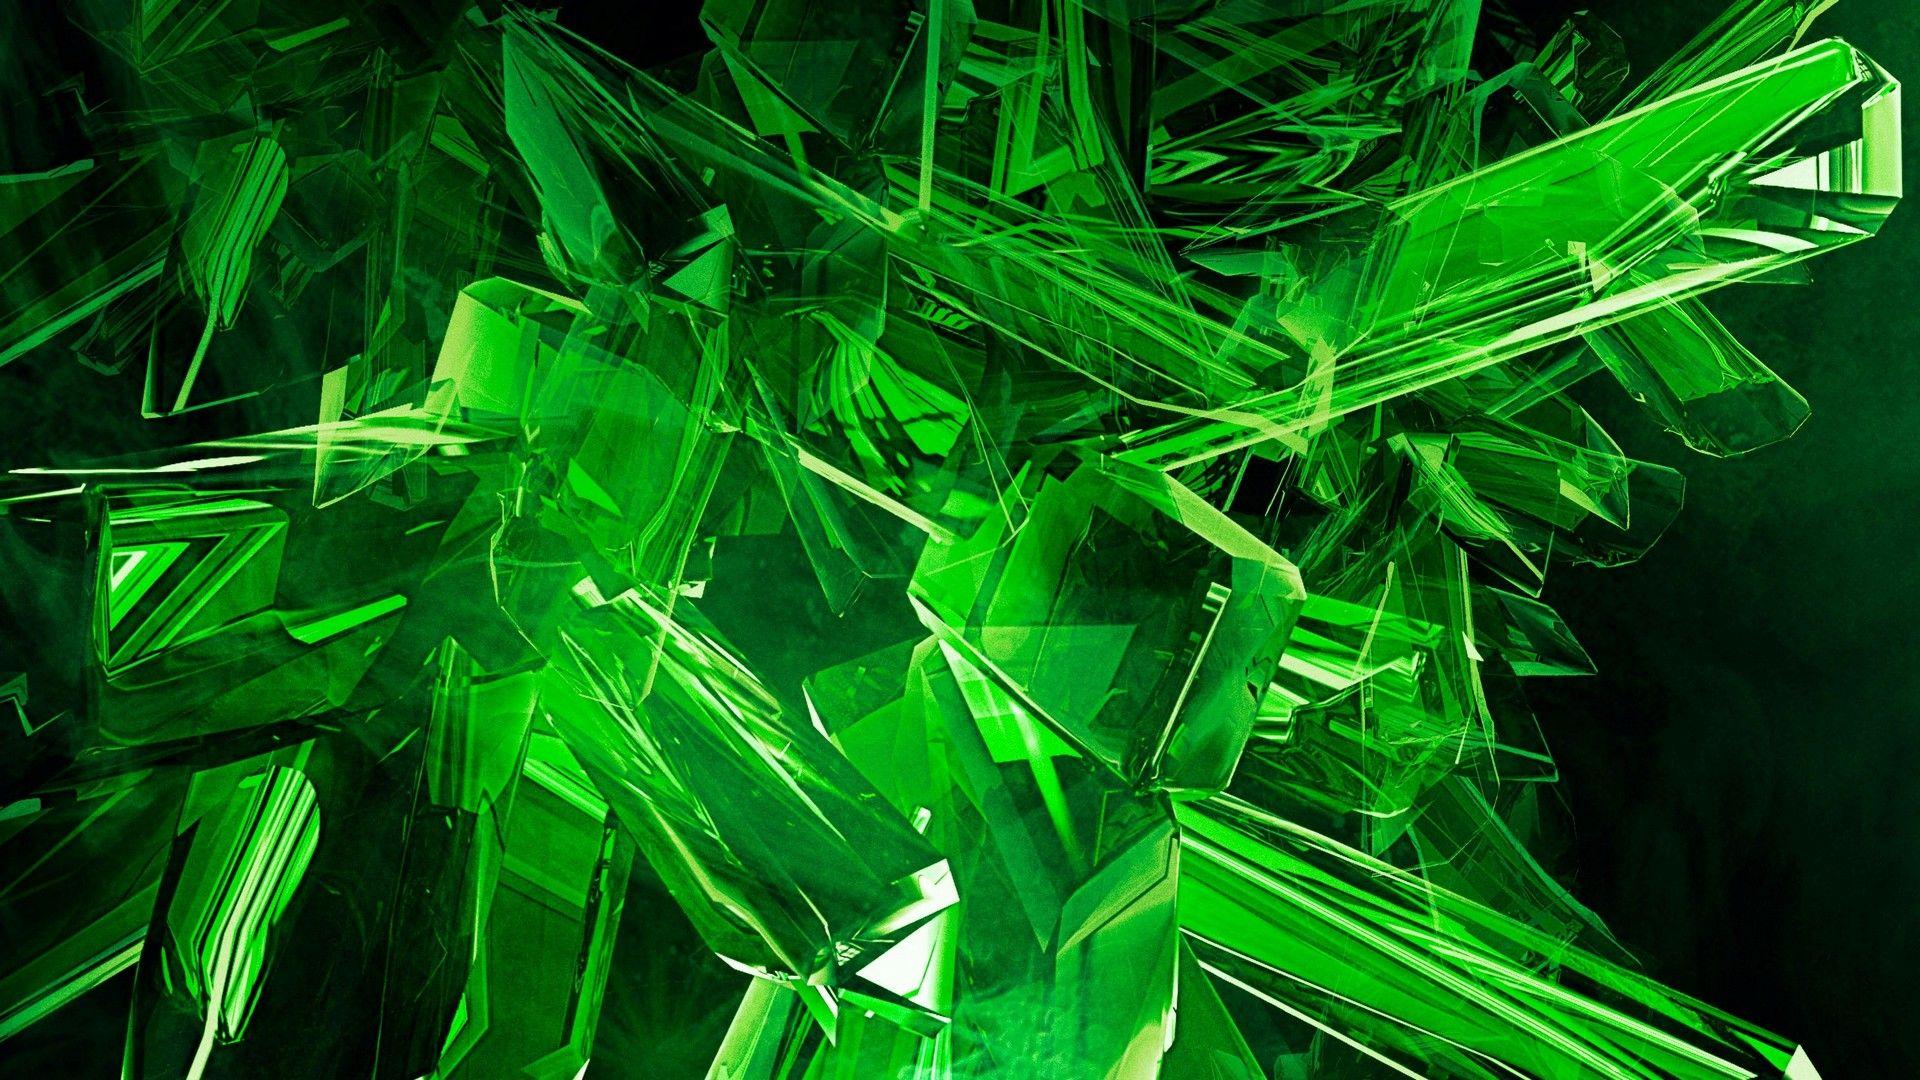 Cool Green wallpaper hd